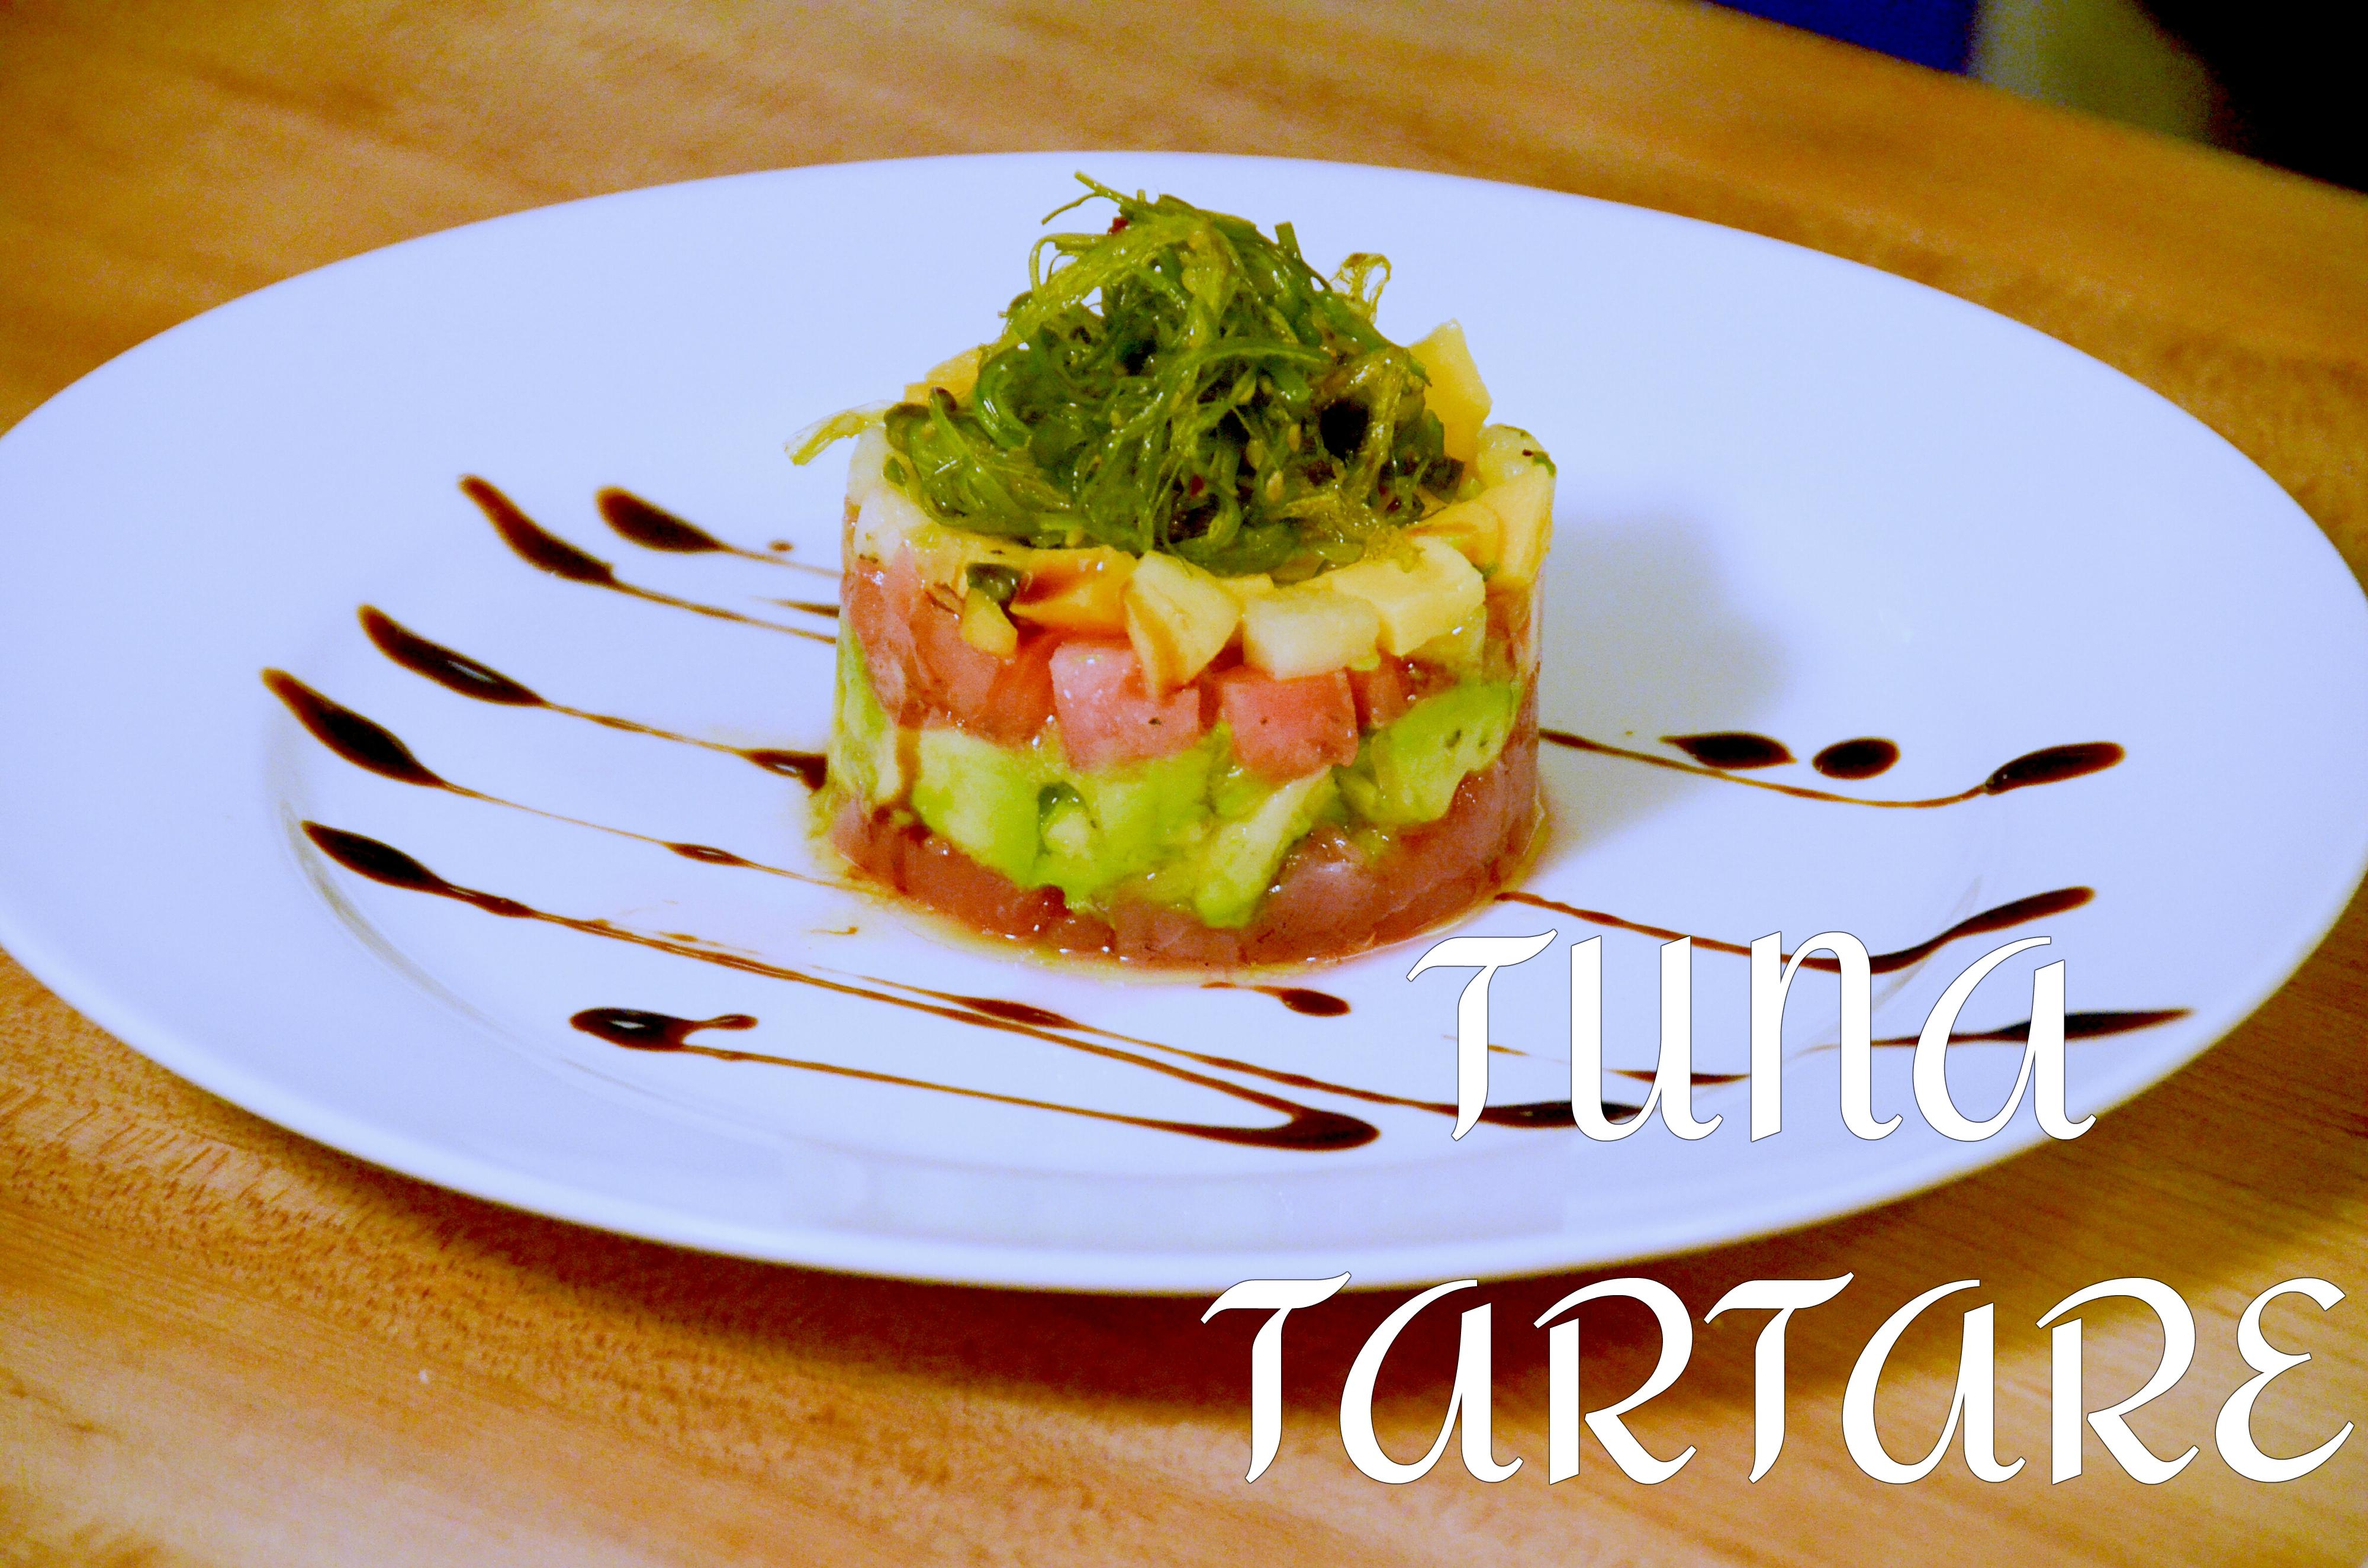 Tomato, Mango, Avocado, Tuna Tartare